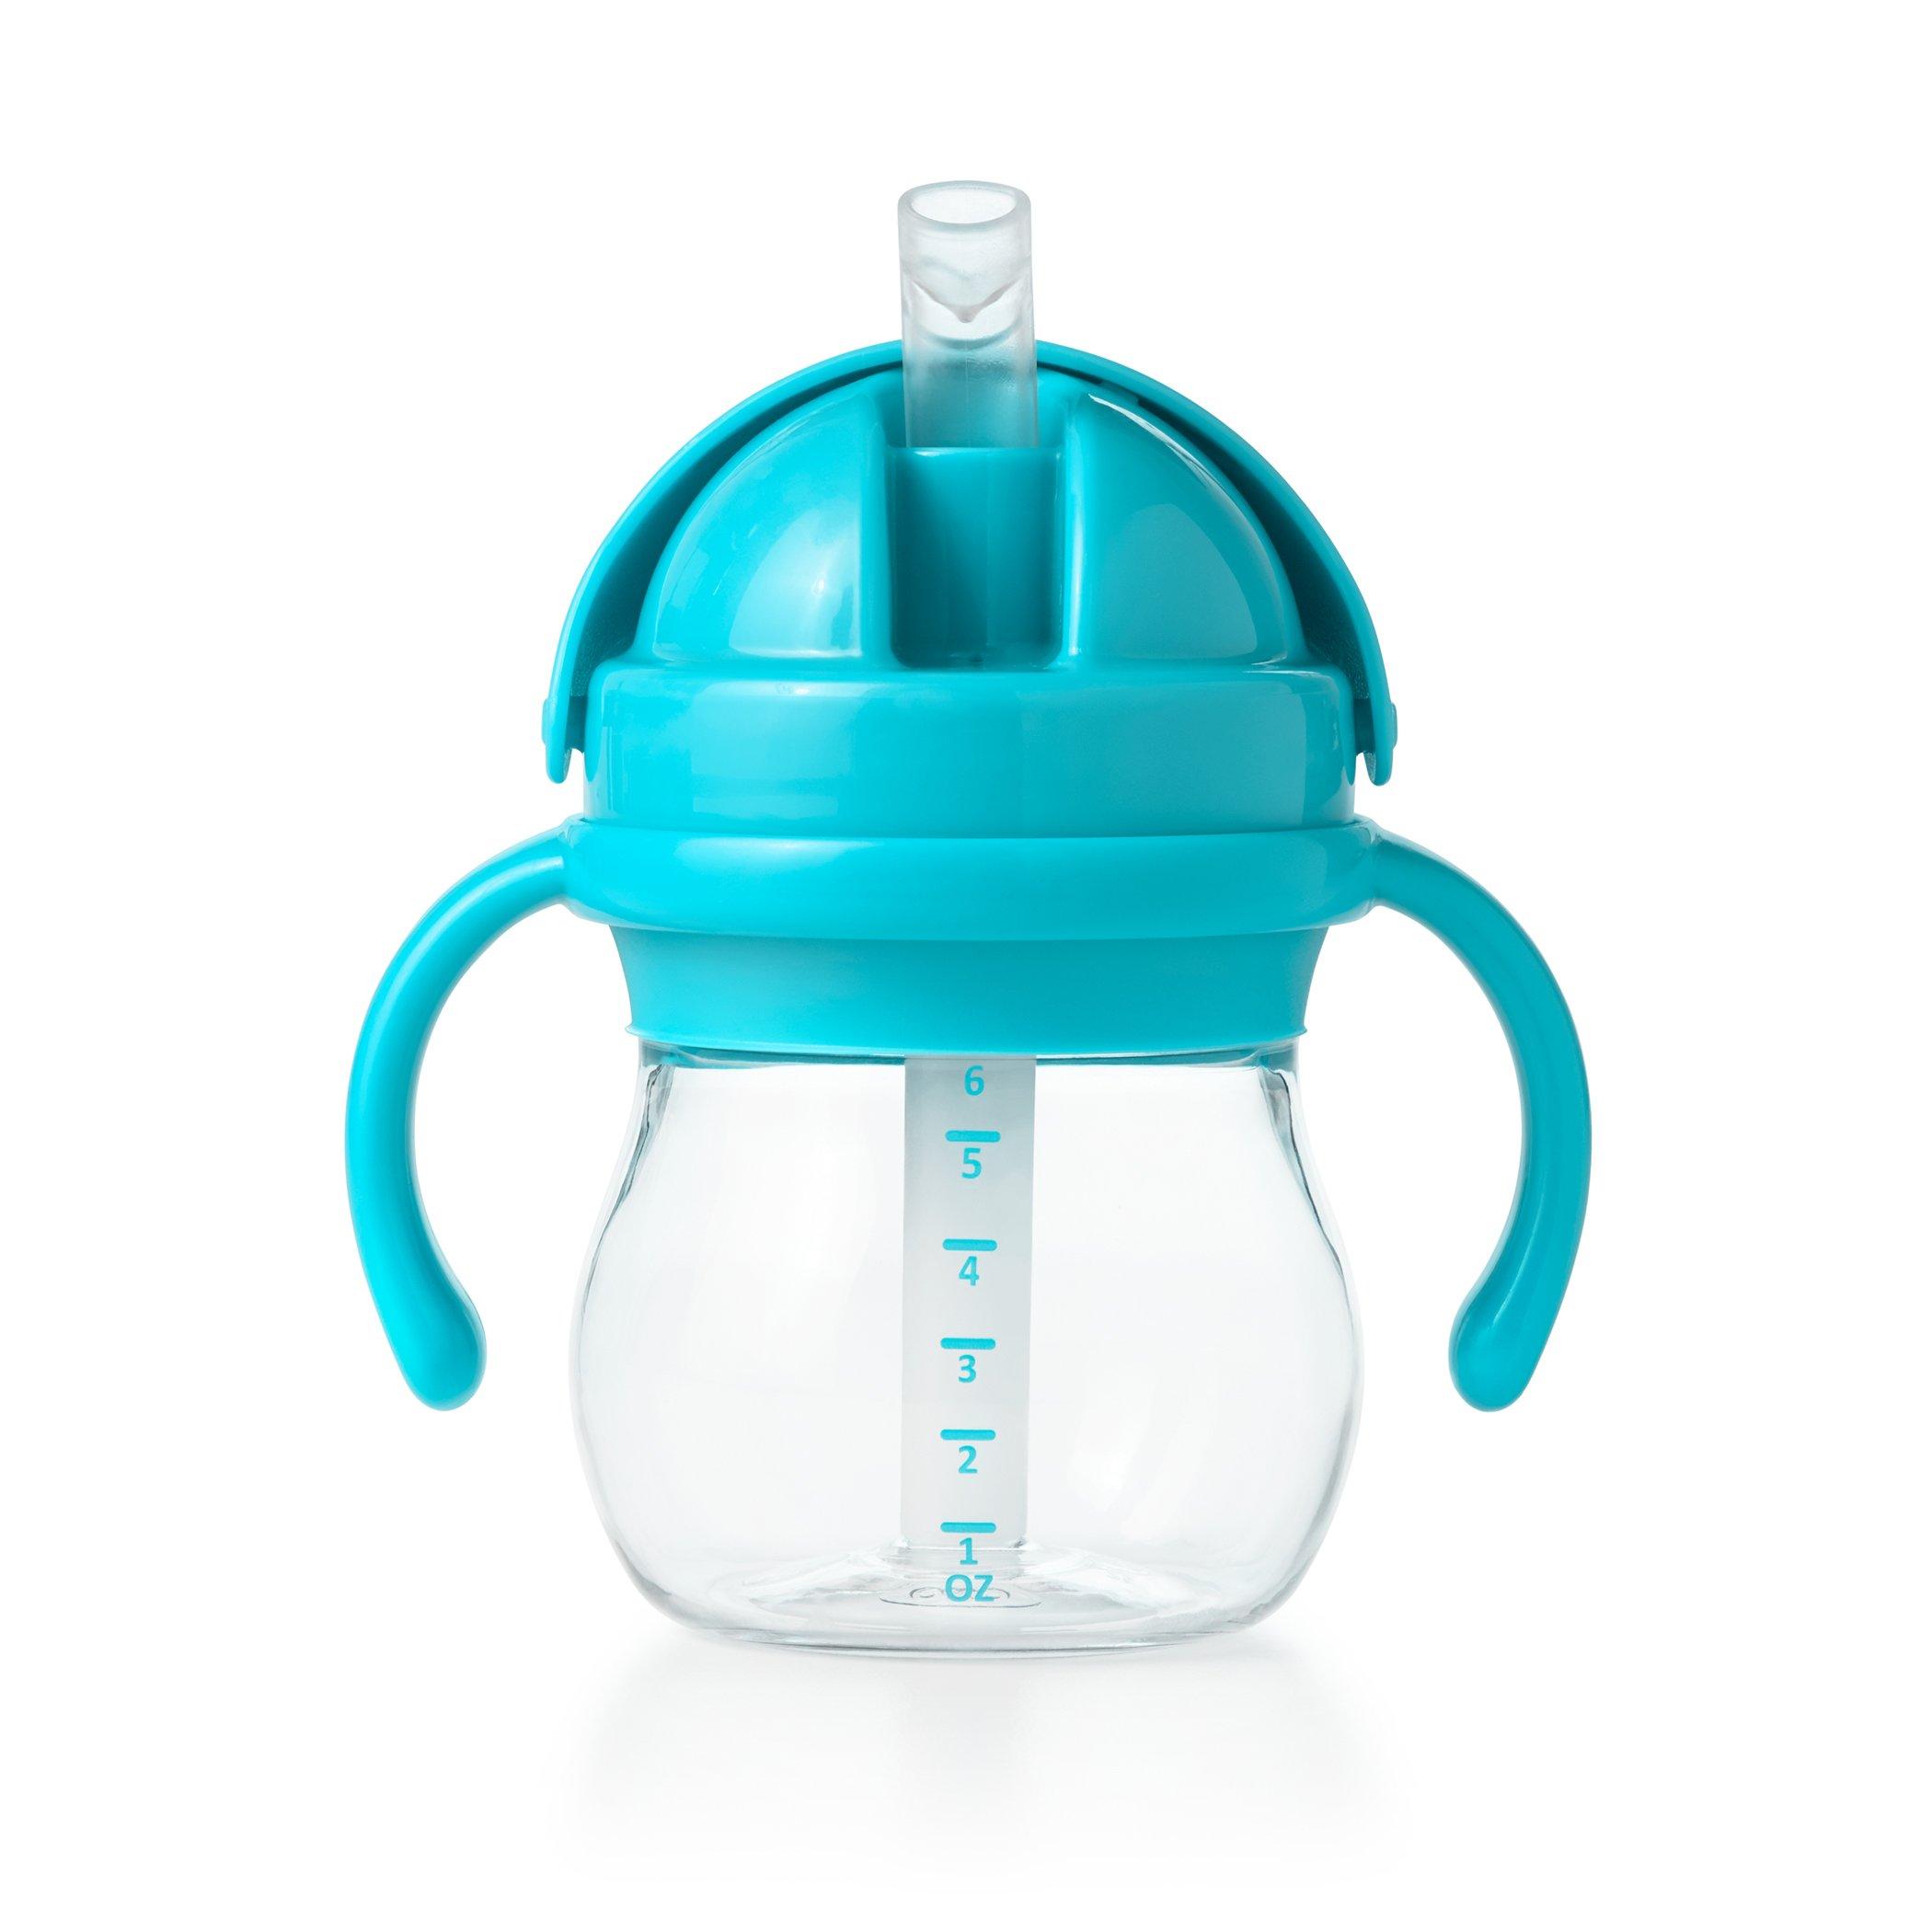 Amazon.com : Philips Avent My Bendy Straw Cup, 7oz, 2pk, Blue/Green, SCF790/21 : Baby